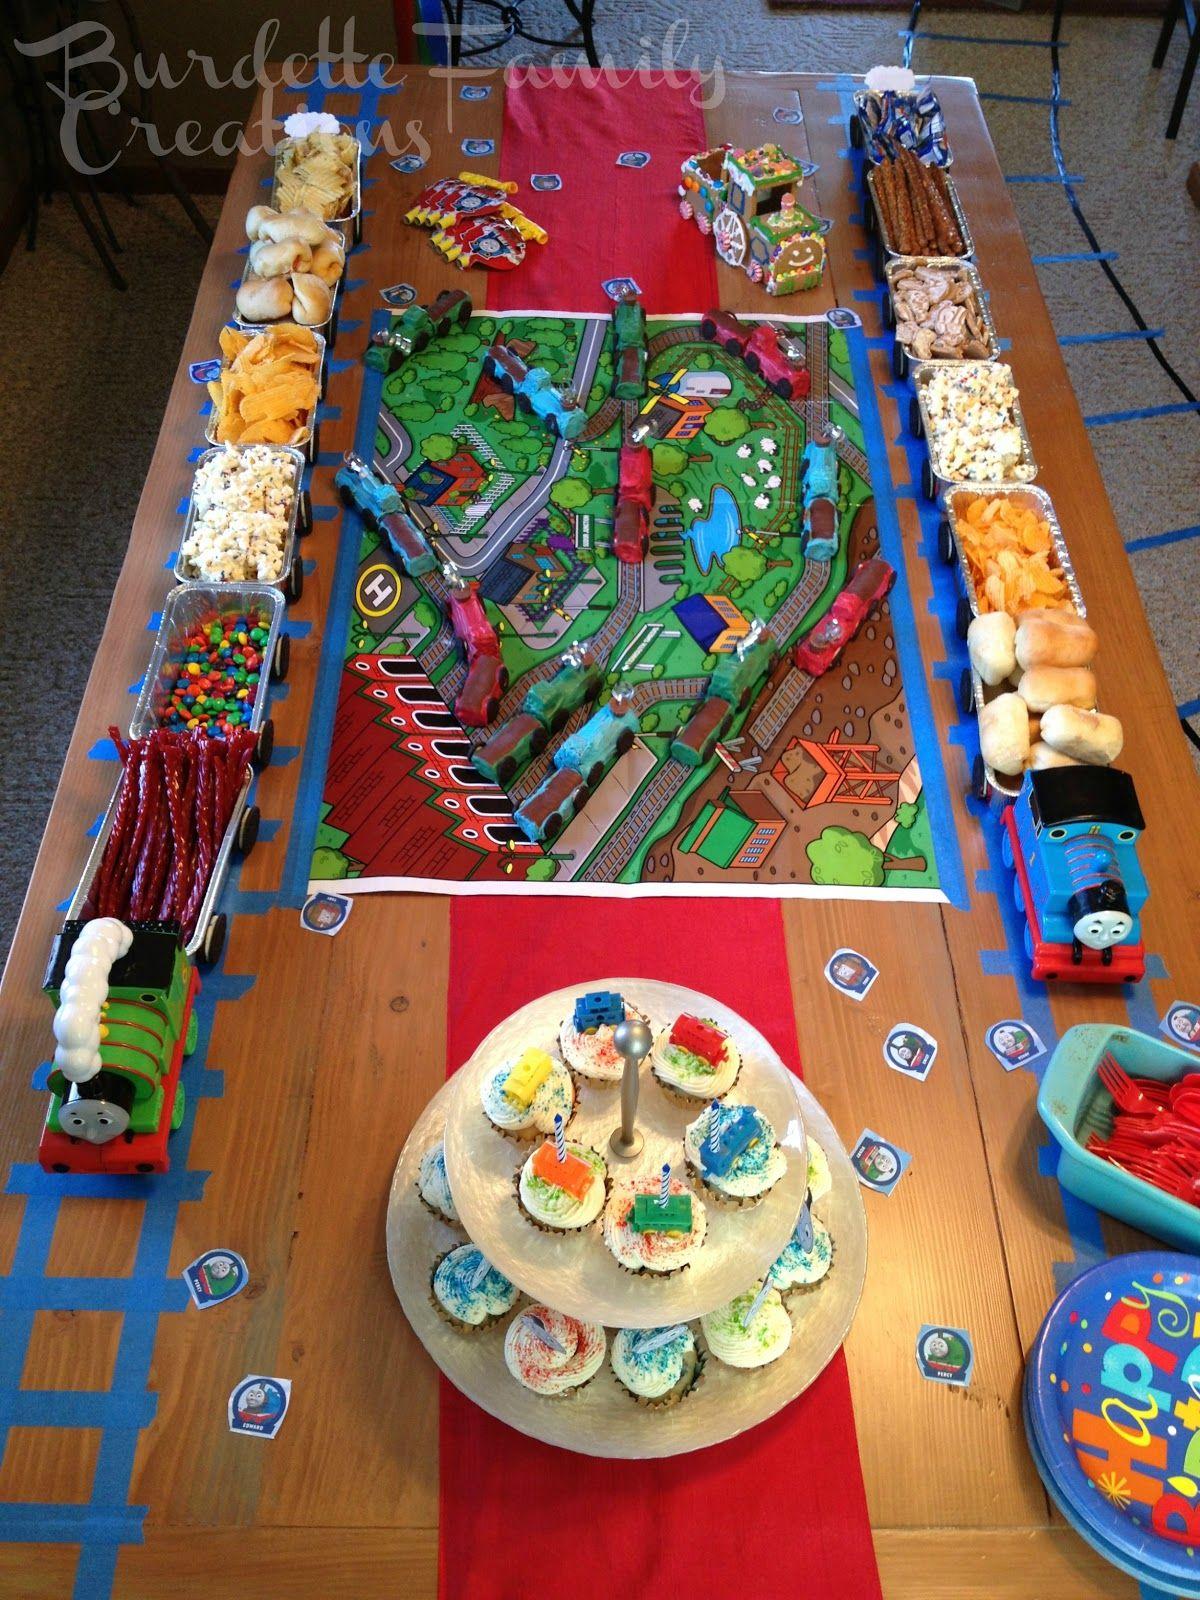 burdette family creations thomas the train birthday party jamar b day pinterest birthdays. Black Bedroom Furniture Sets. Home Design Ideas